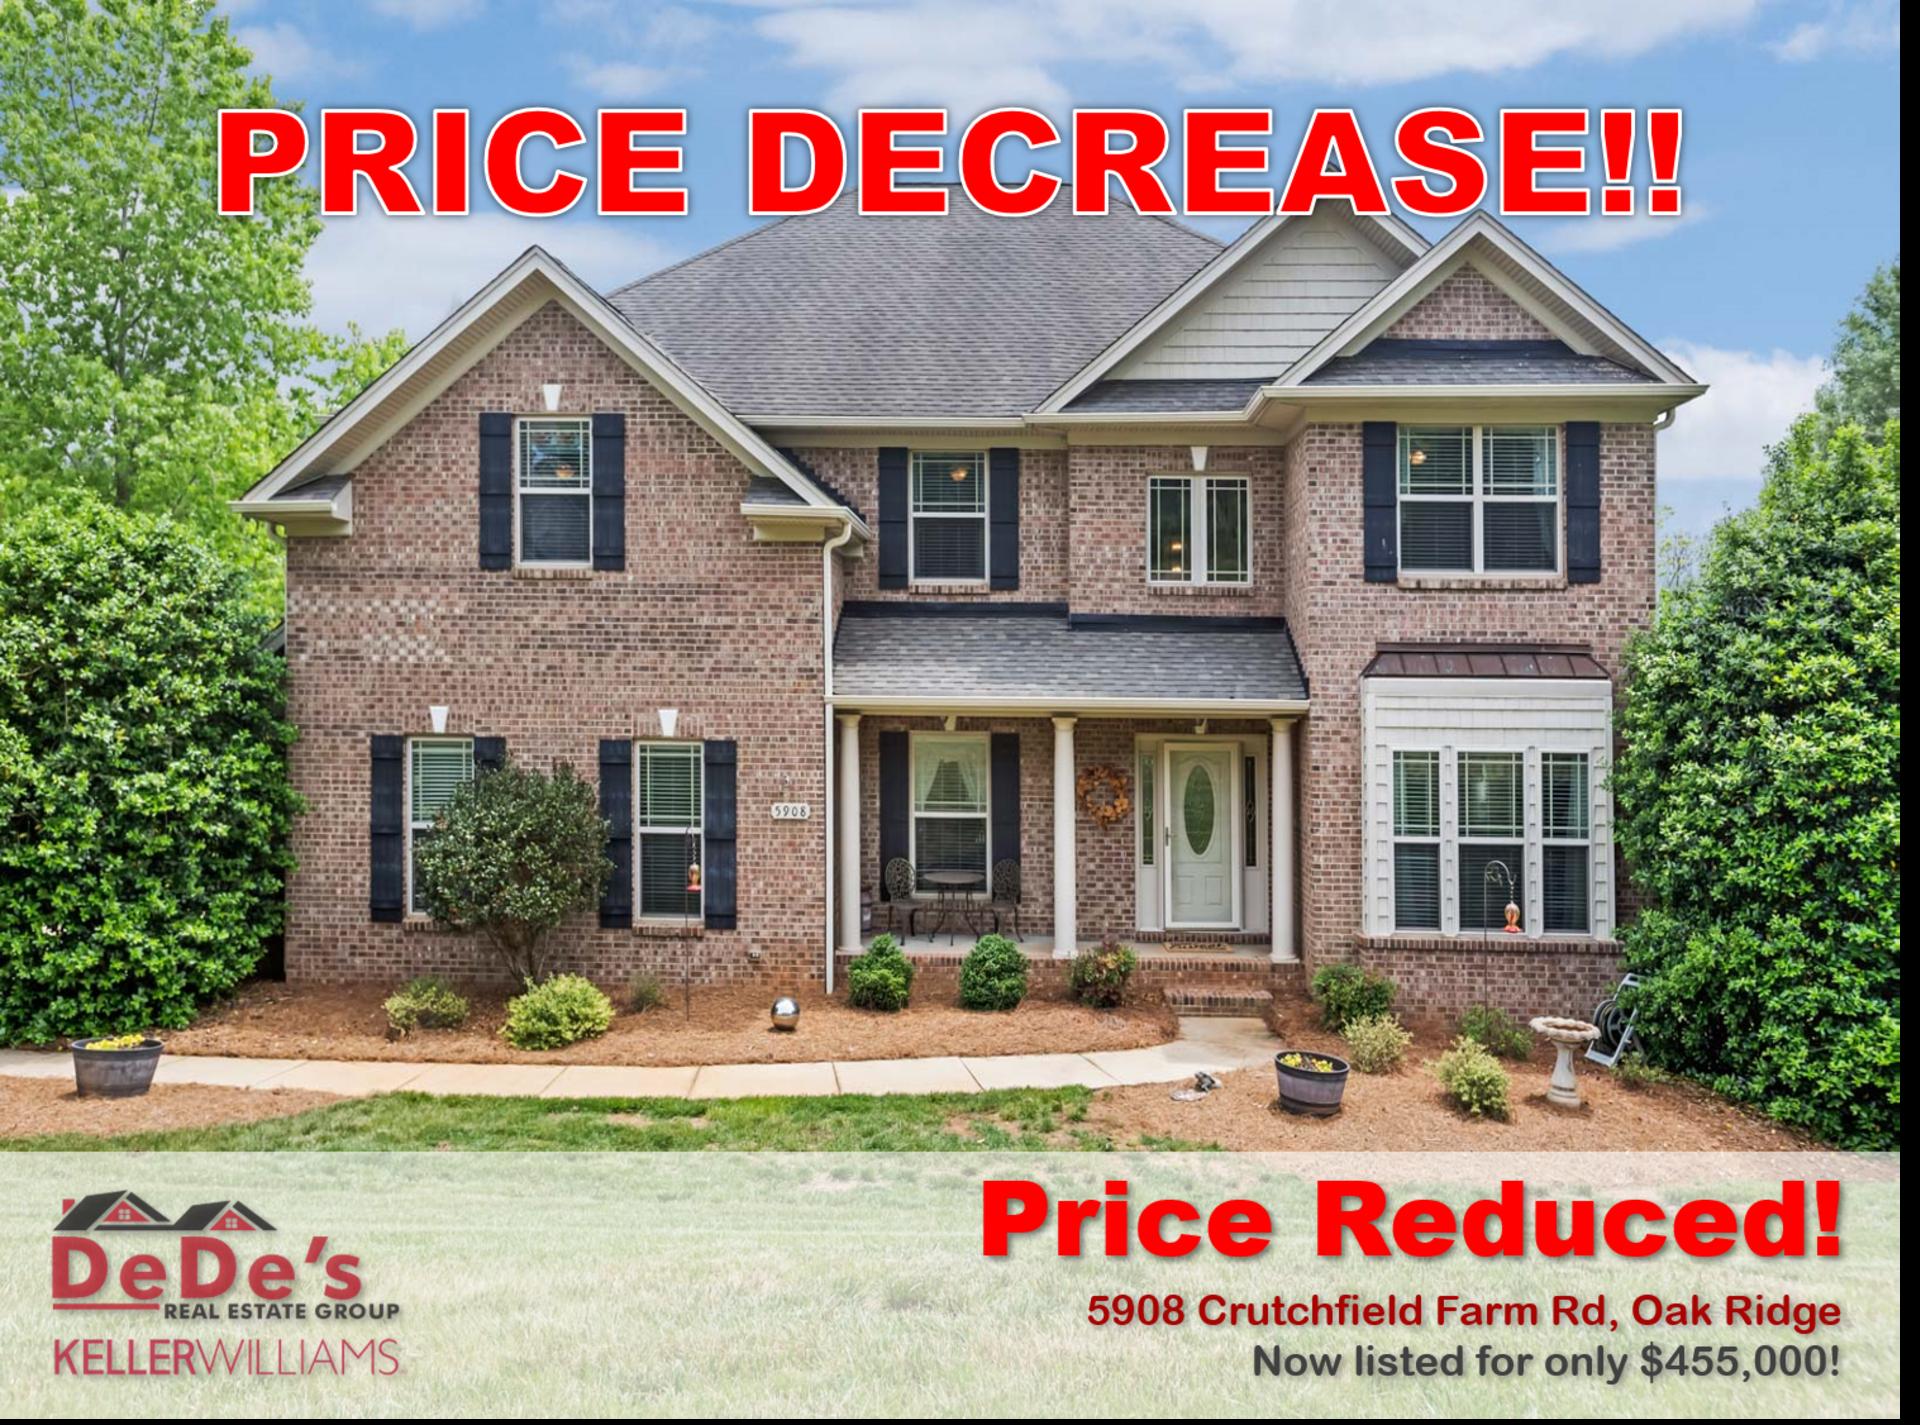 Price Reduced on Oak Ridge Home!